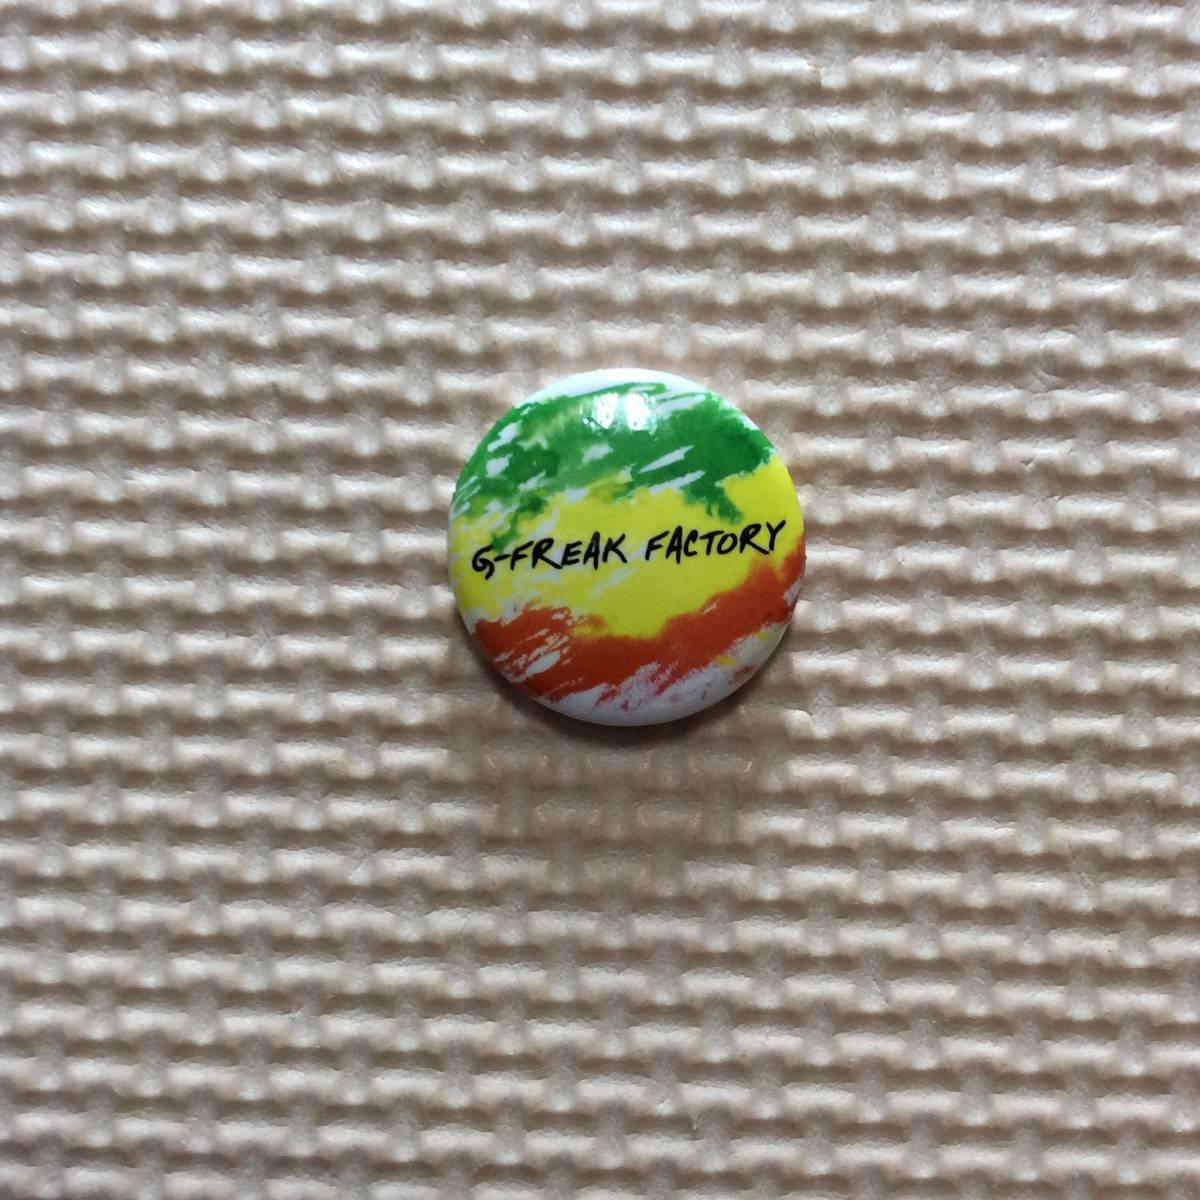 RSR ライジングサン2017 RISINGSUN 缶バッジ G-FREAK FACTORY